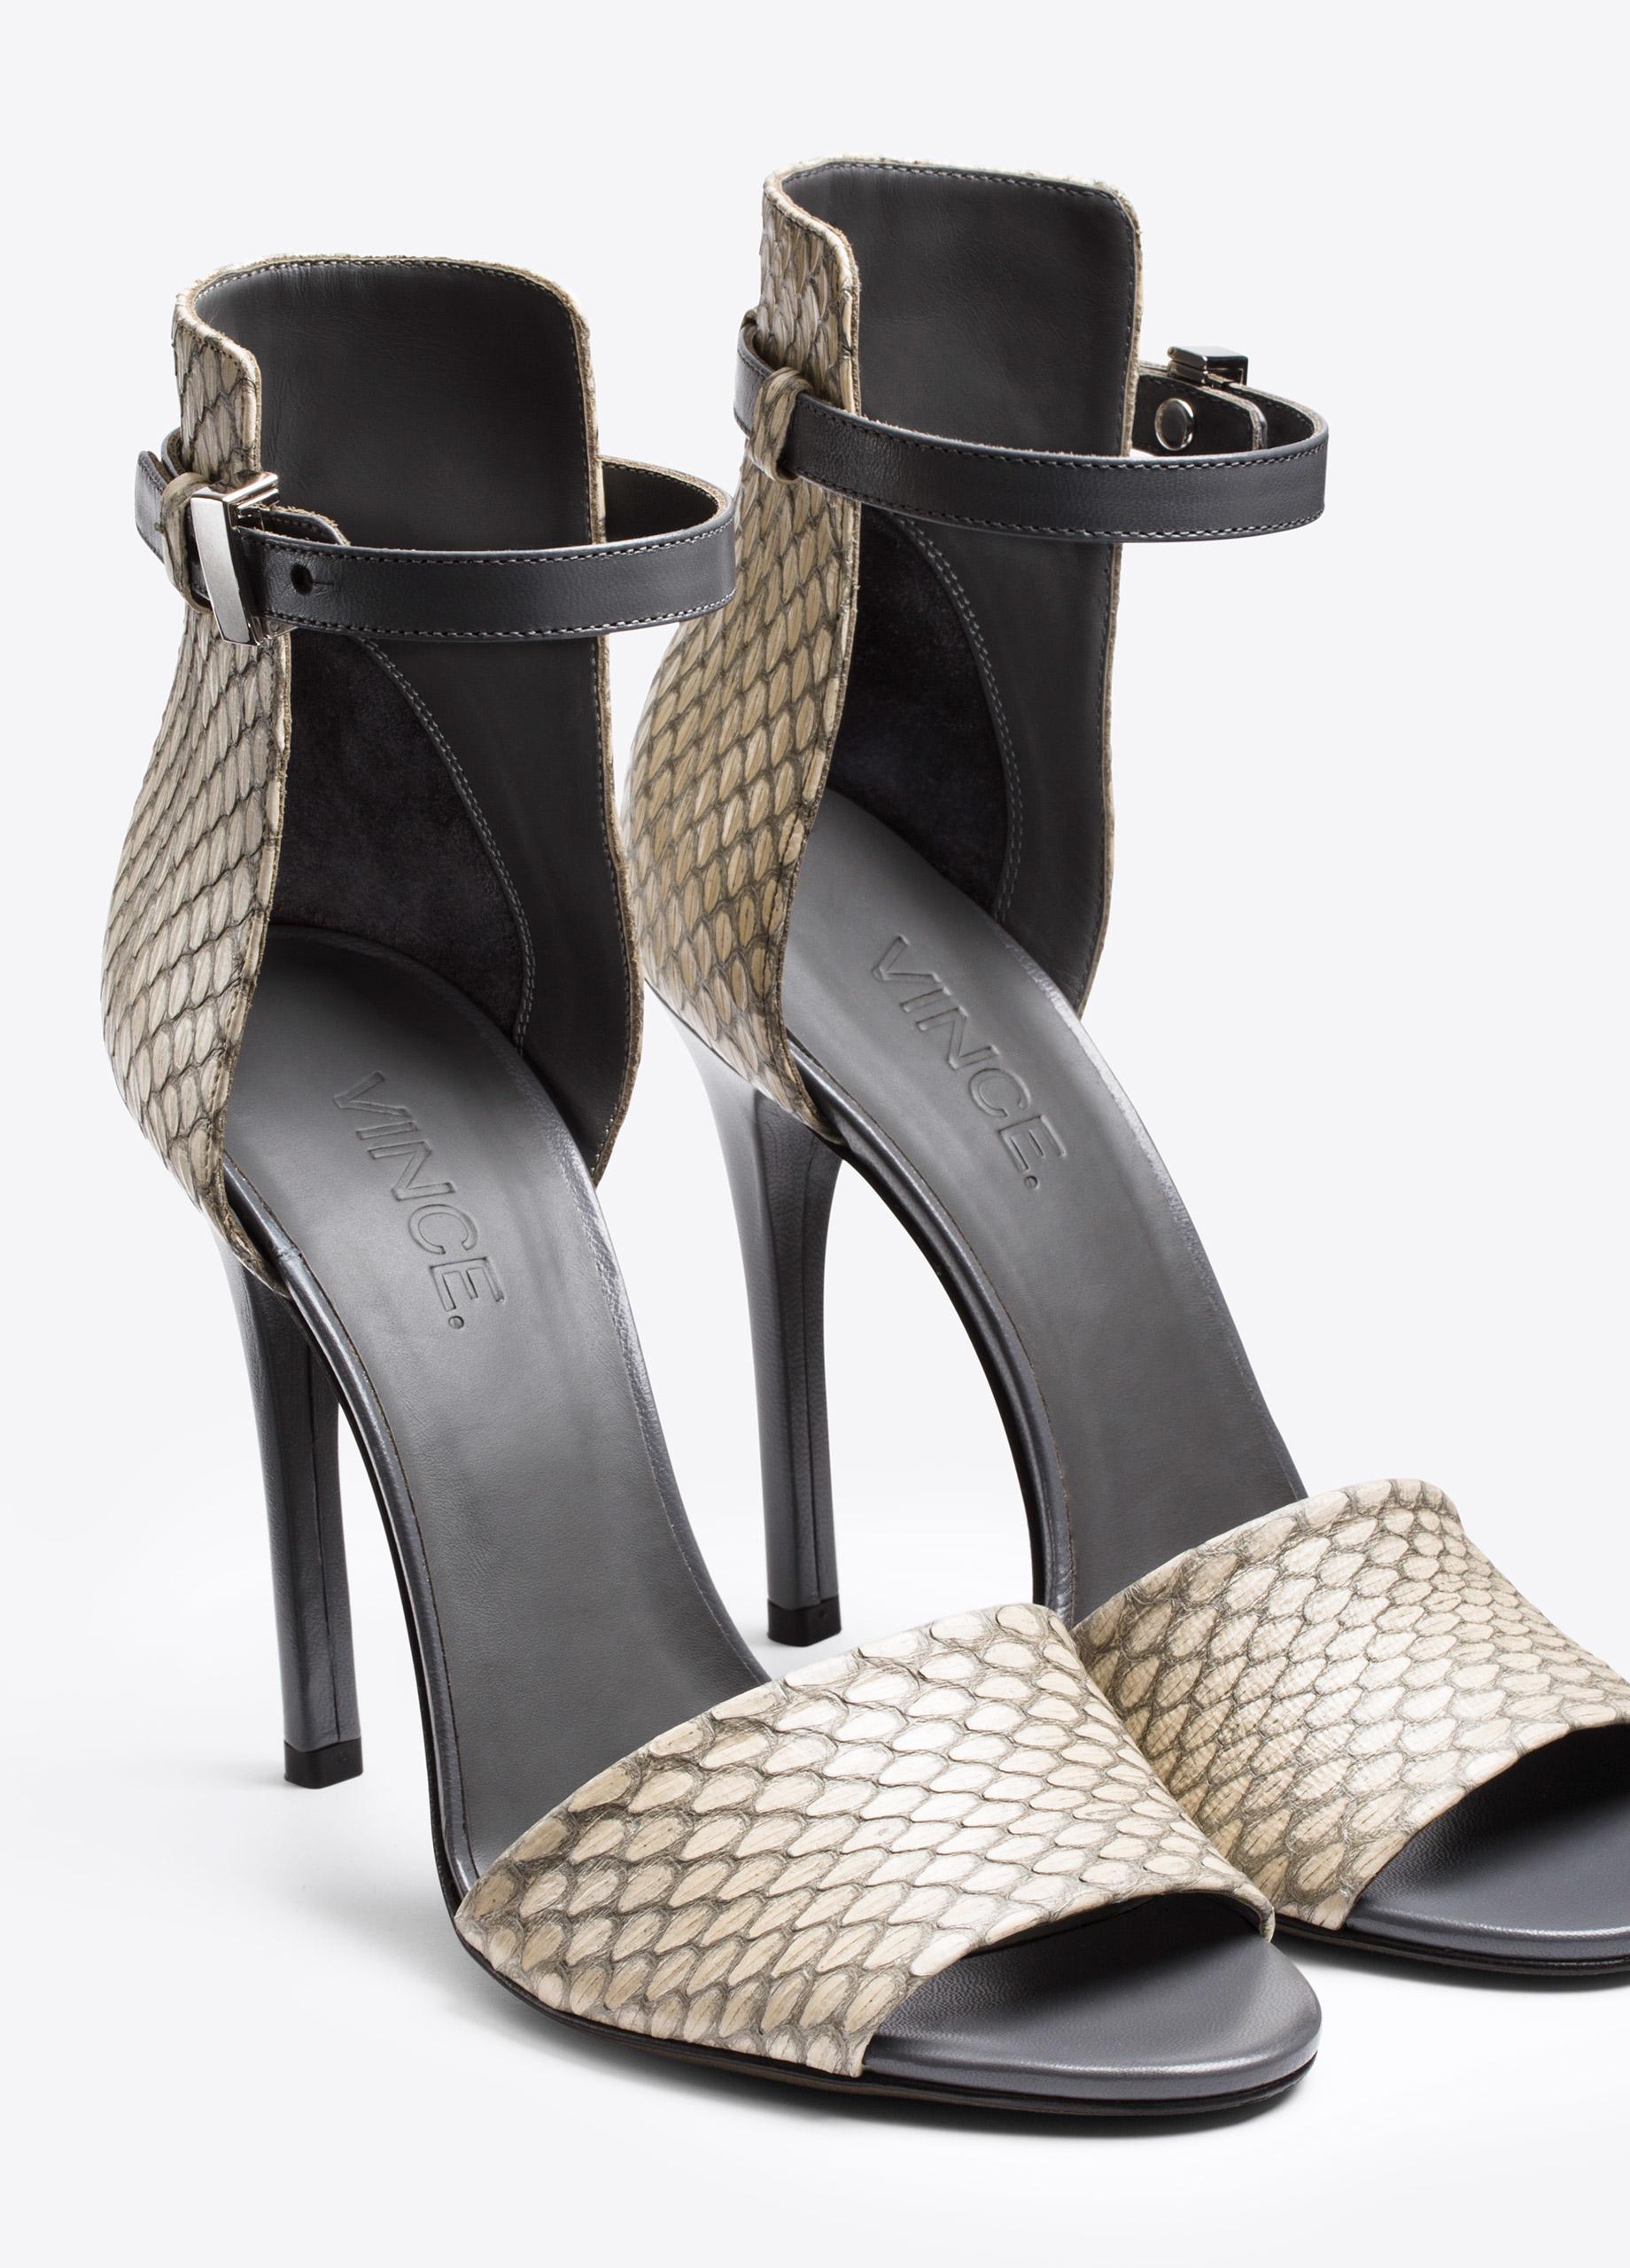 Sarah Jessica Parker and Metallic Stilettos of Balenciaga